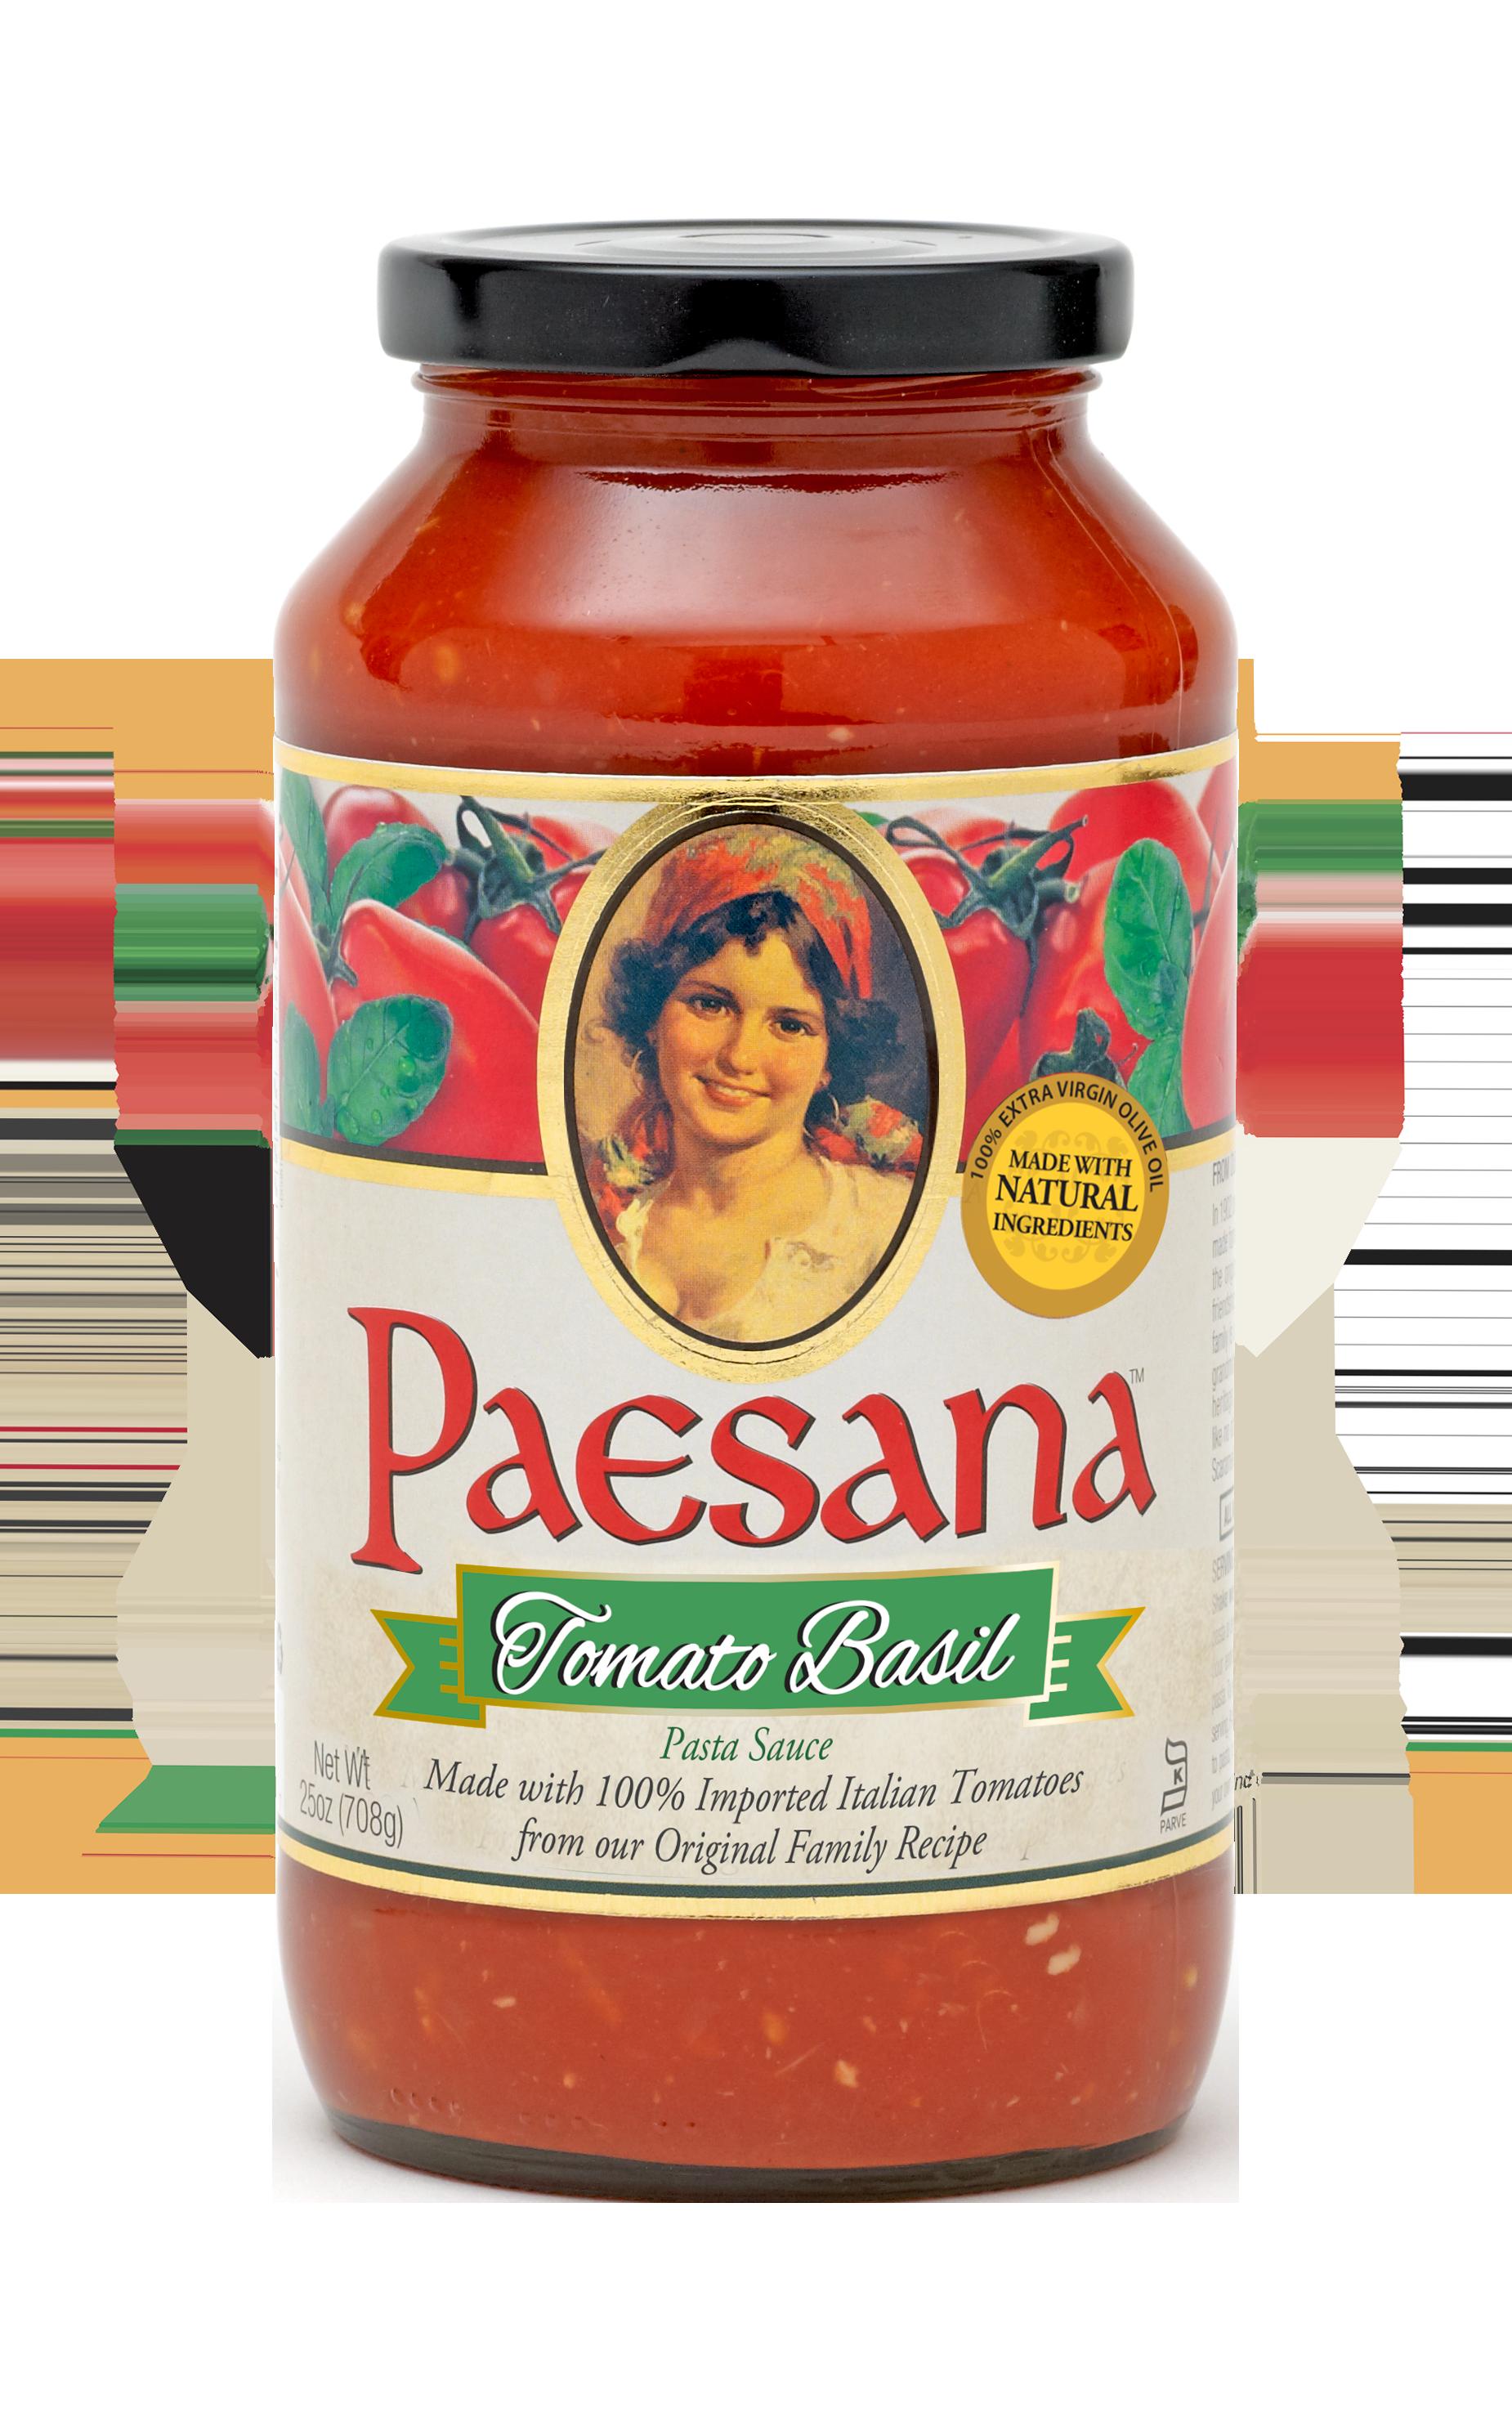 Paesana Tomato Basil Sauce